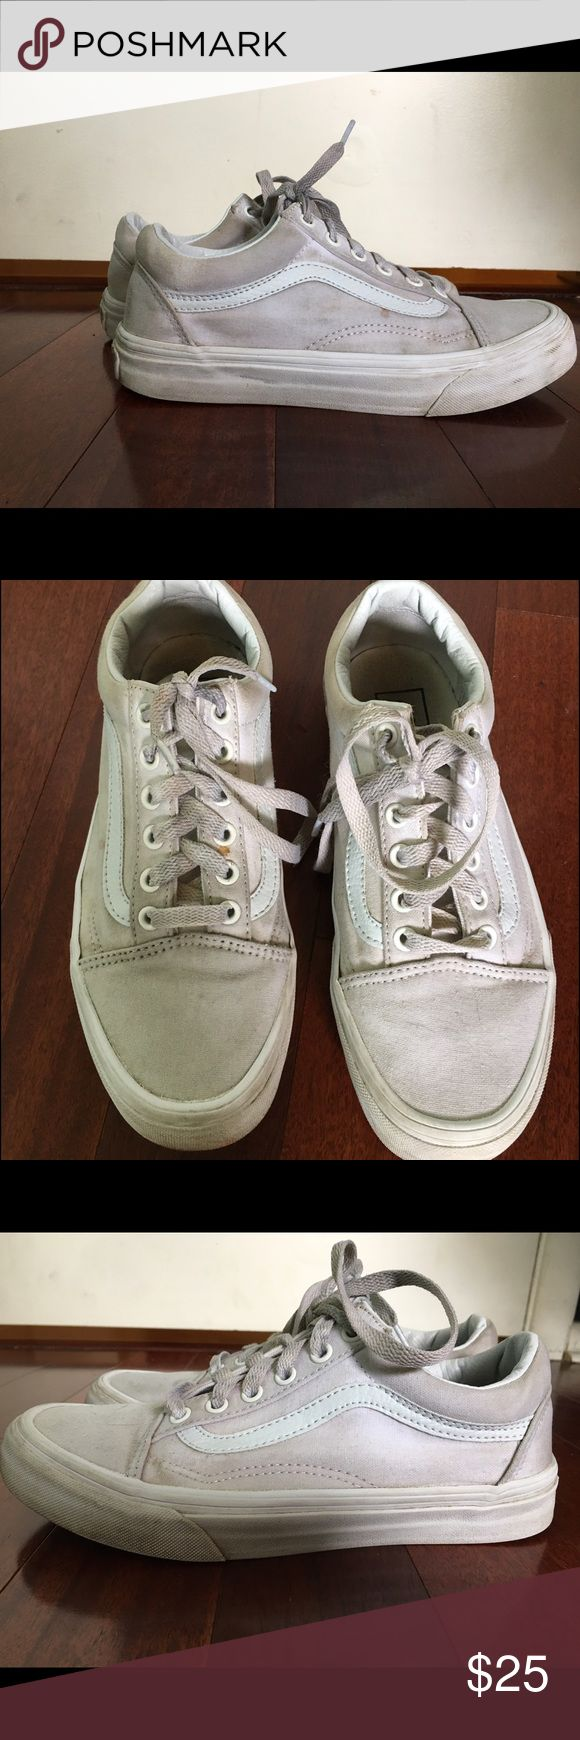 White sk8-low vans Very worn in. Size 7.5 women Vans Shoes Sneakers